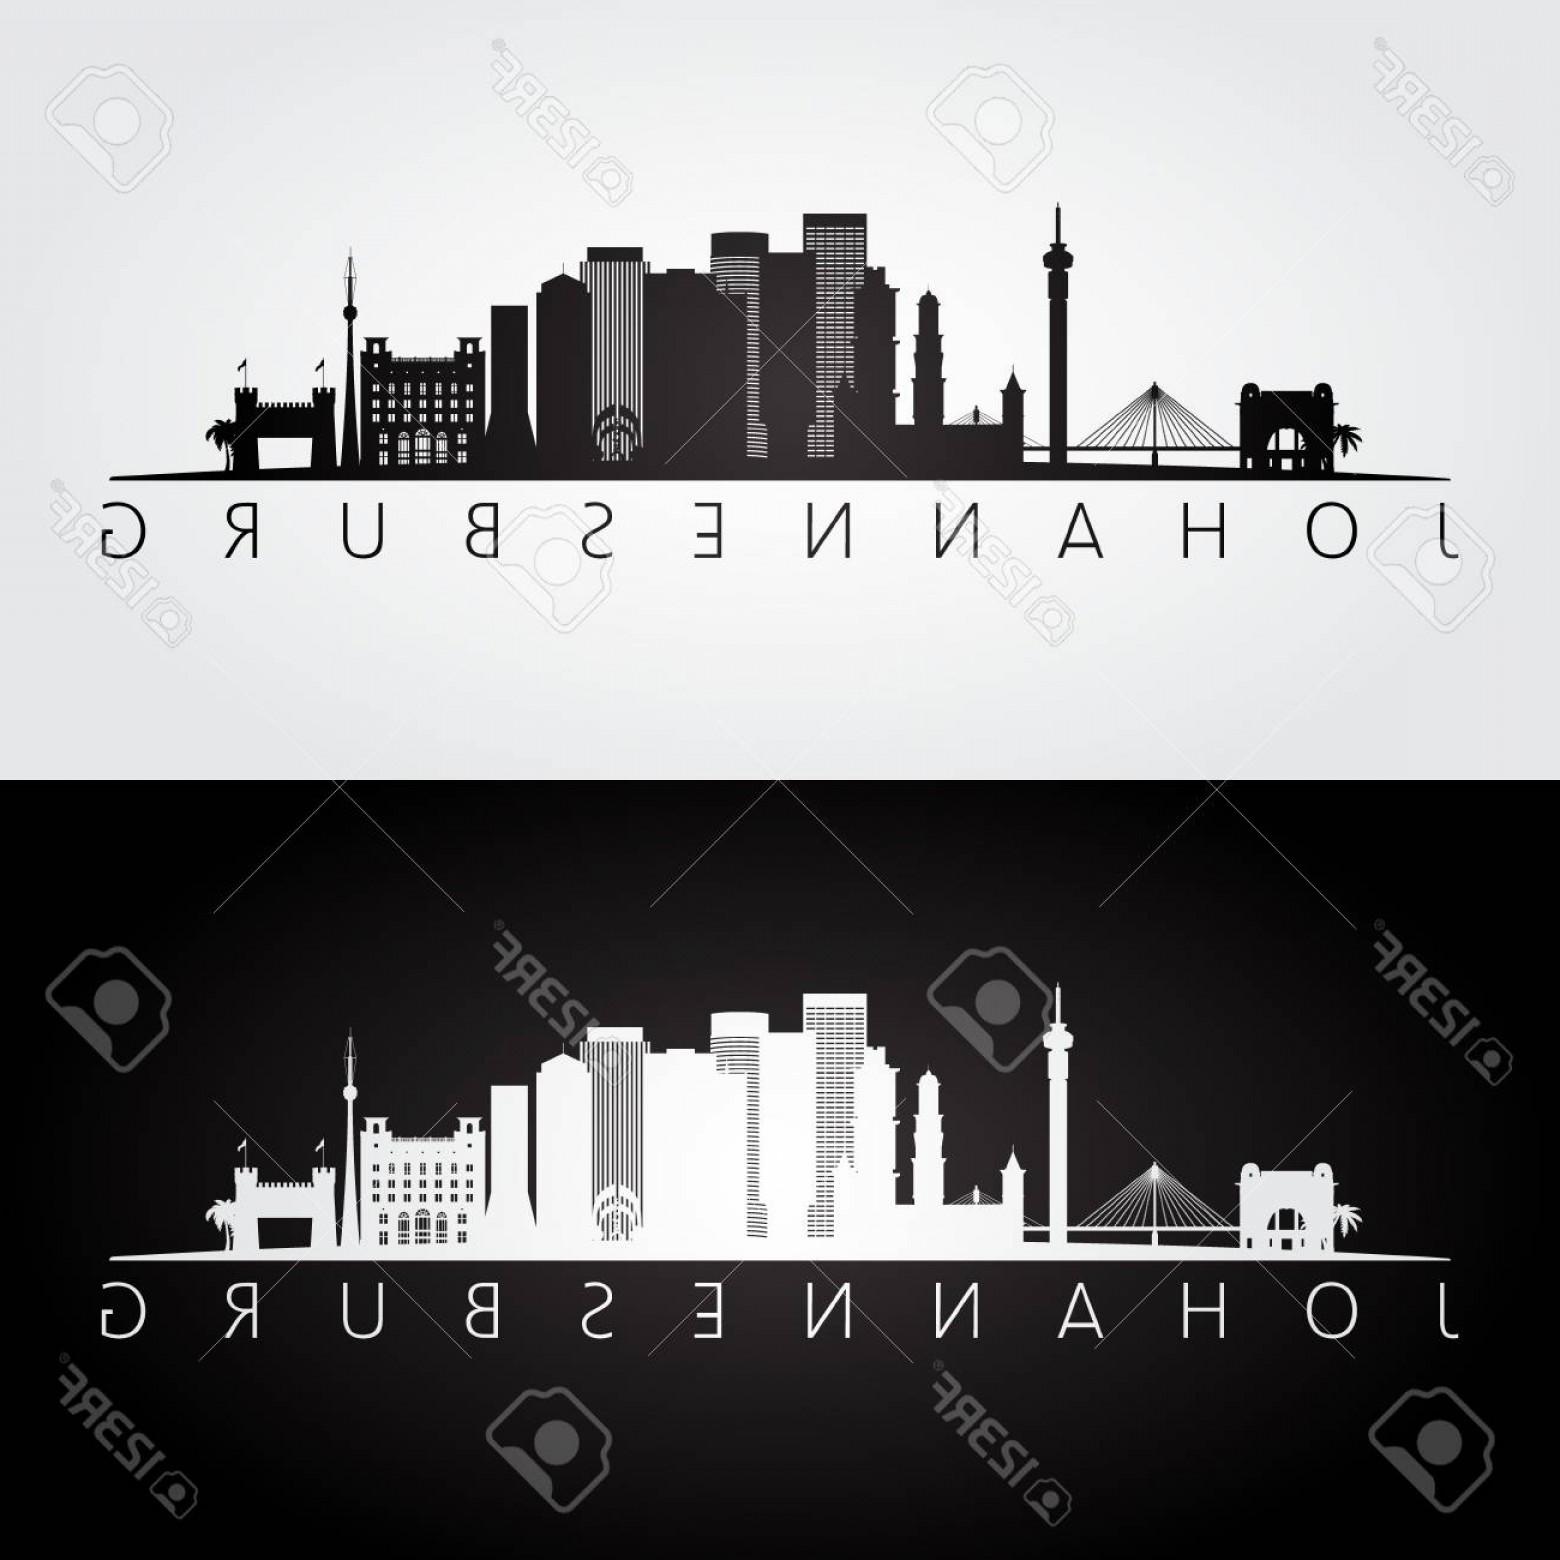 1560x1560 Photostock Vector Johannesburg Skyline And Landmarks Silhouette